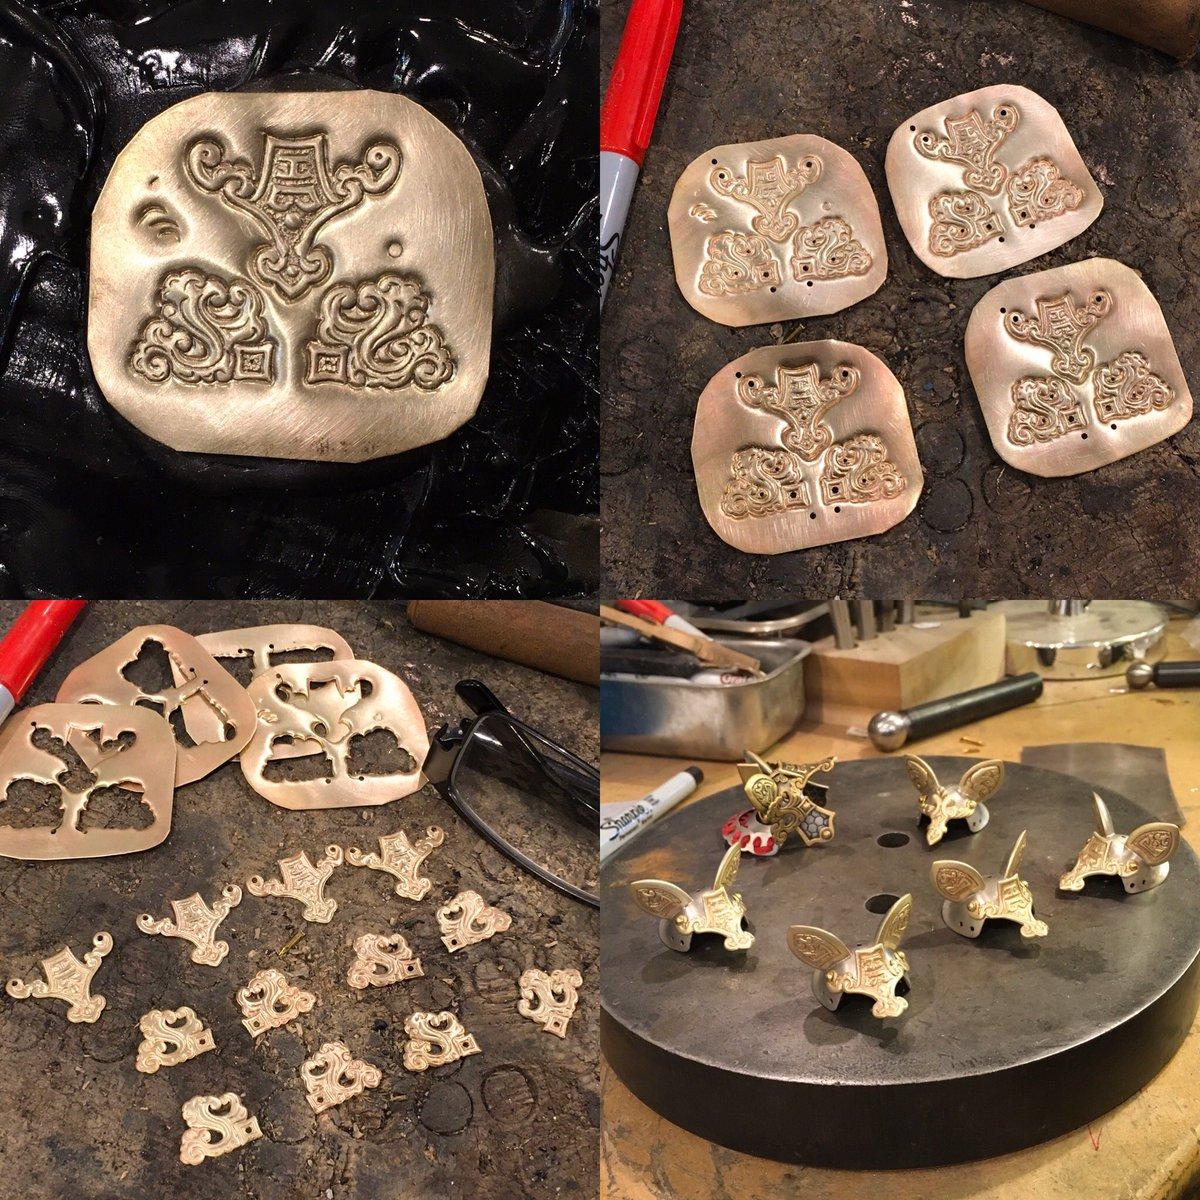 For steps of making parts for mice helmets.  #sculpture #jewellery @CalgaryArtsDev @AlbertaUArts @EskerFoundation @Glenbow @BluerockGallery @Fuse33Calgary @catsofinstagram @ABCraftCouncil @HotArtYYC @ContemporaryYYC @beneadie @GoldbergArts